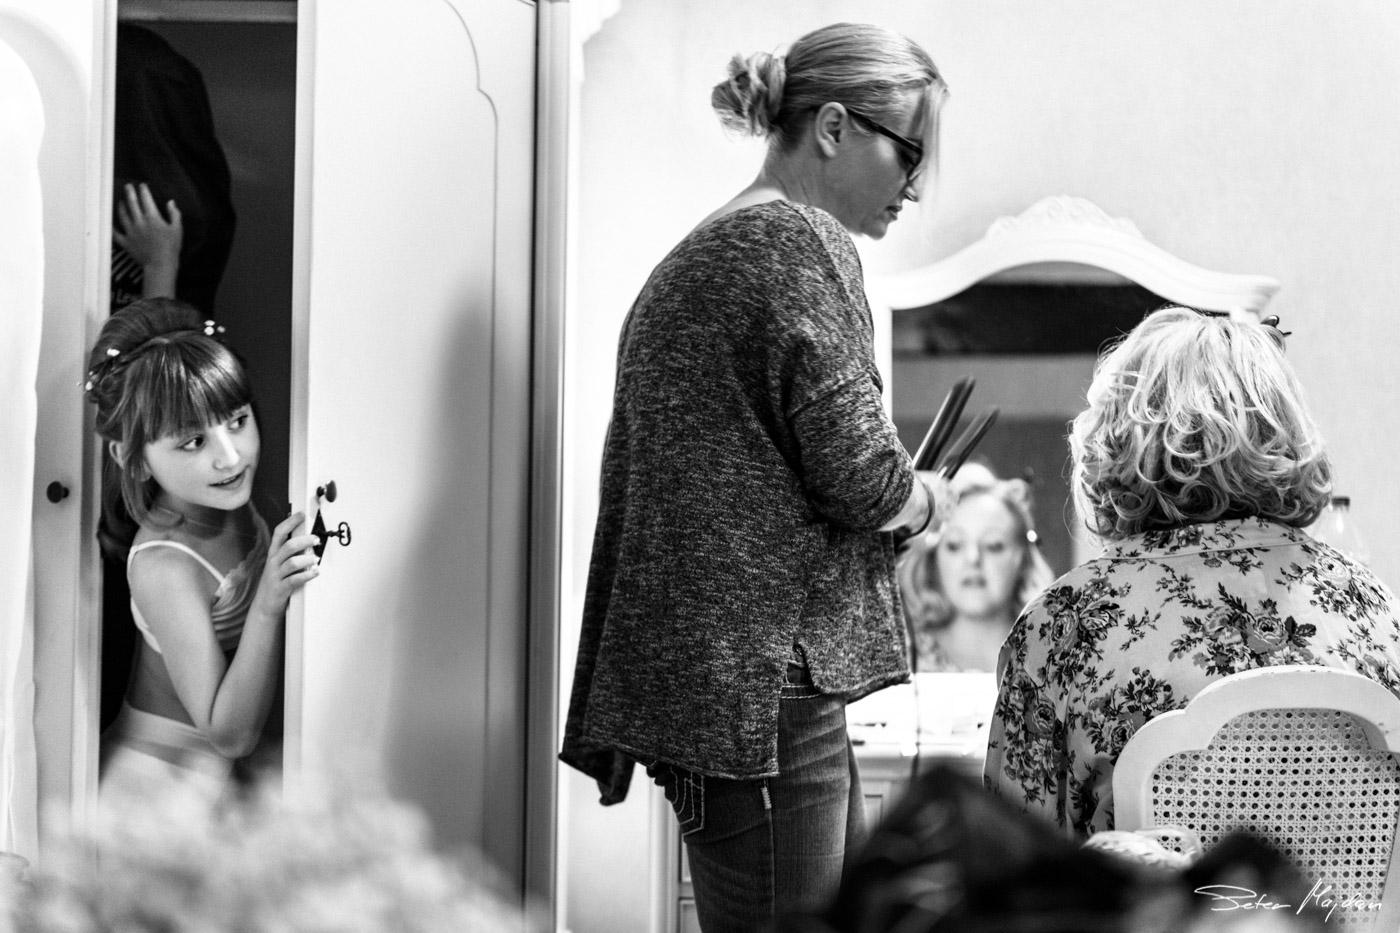 Colwick-hall-wedding-photography-6.jpg